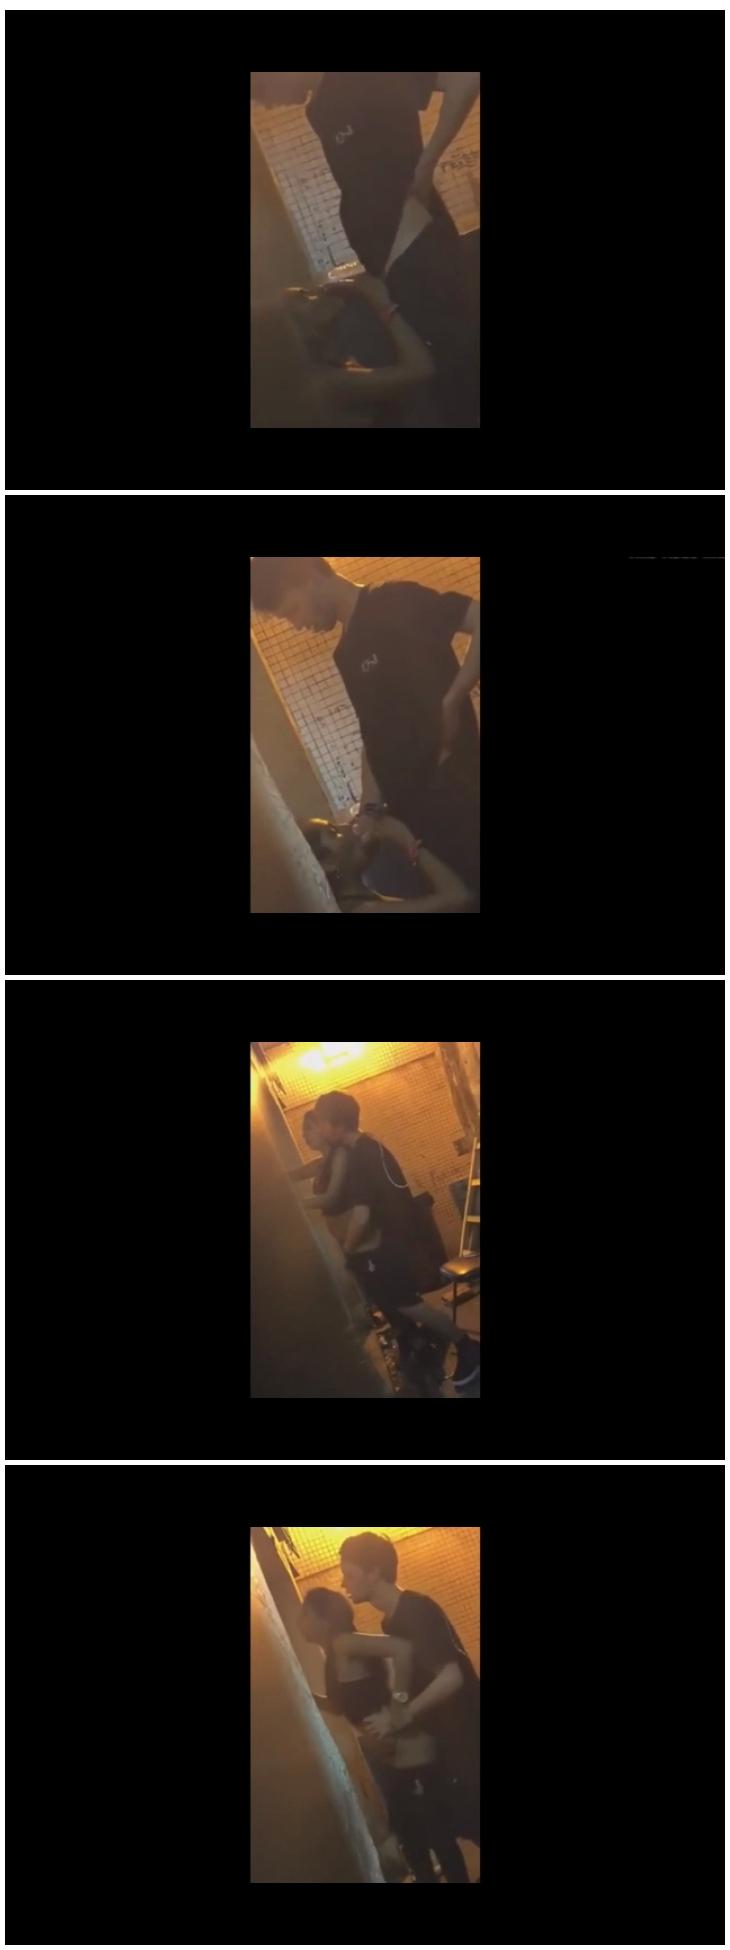 DrunkgirlsloveVZ-n022_cover.jpg